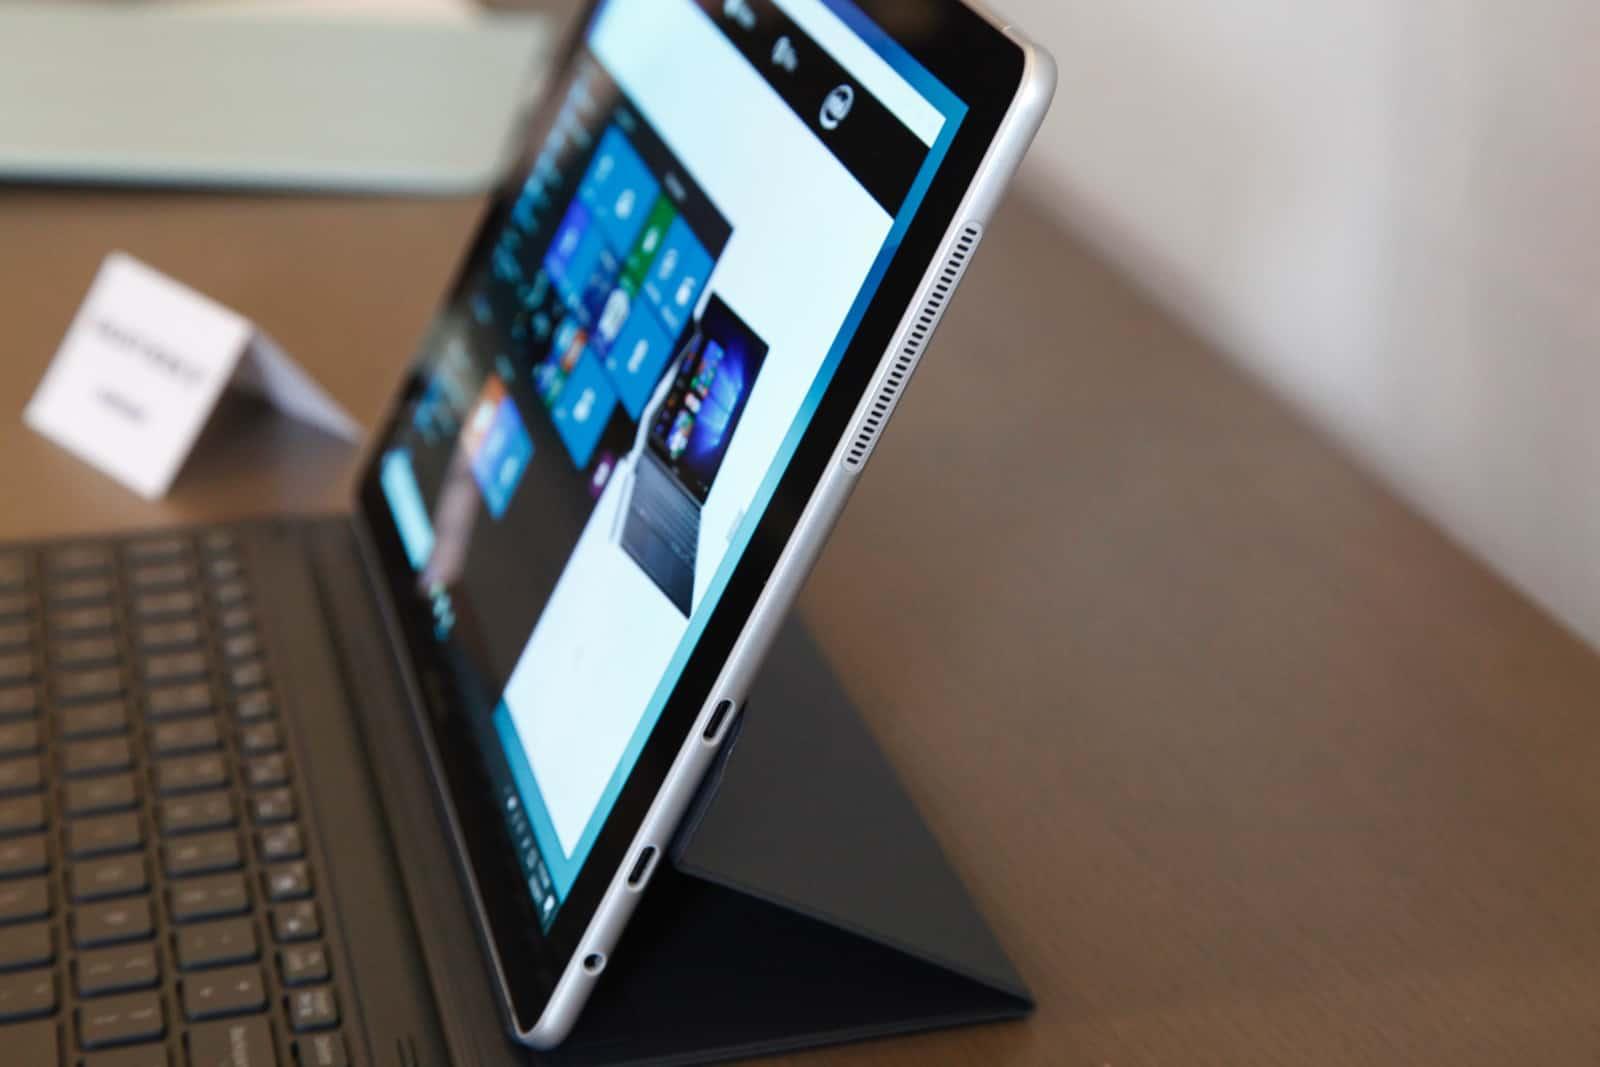 12-inch Samsung Galaxy Book – tablet computer